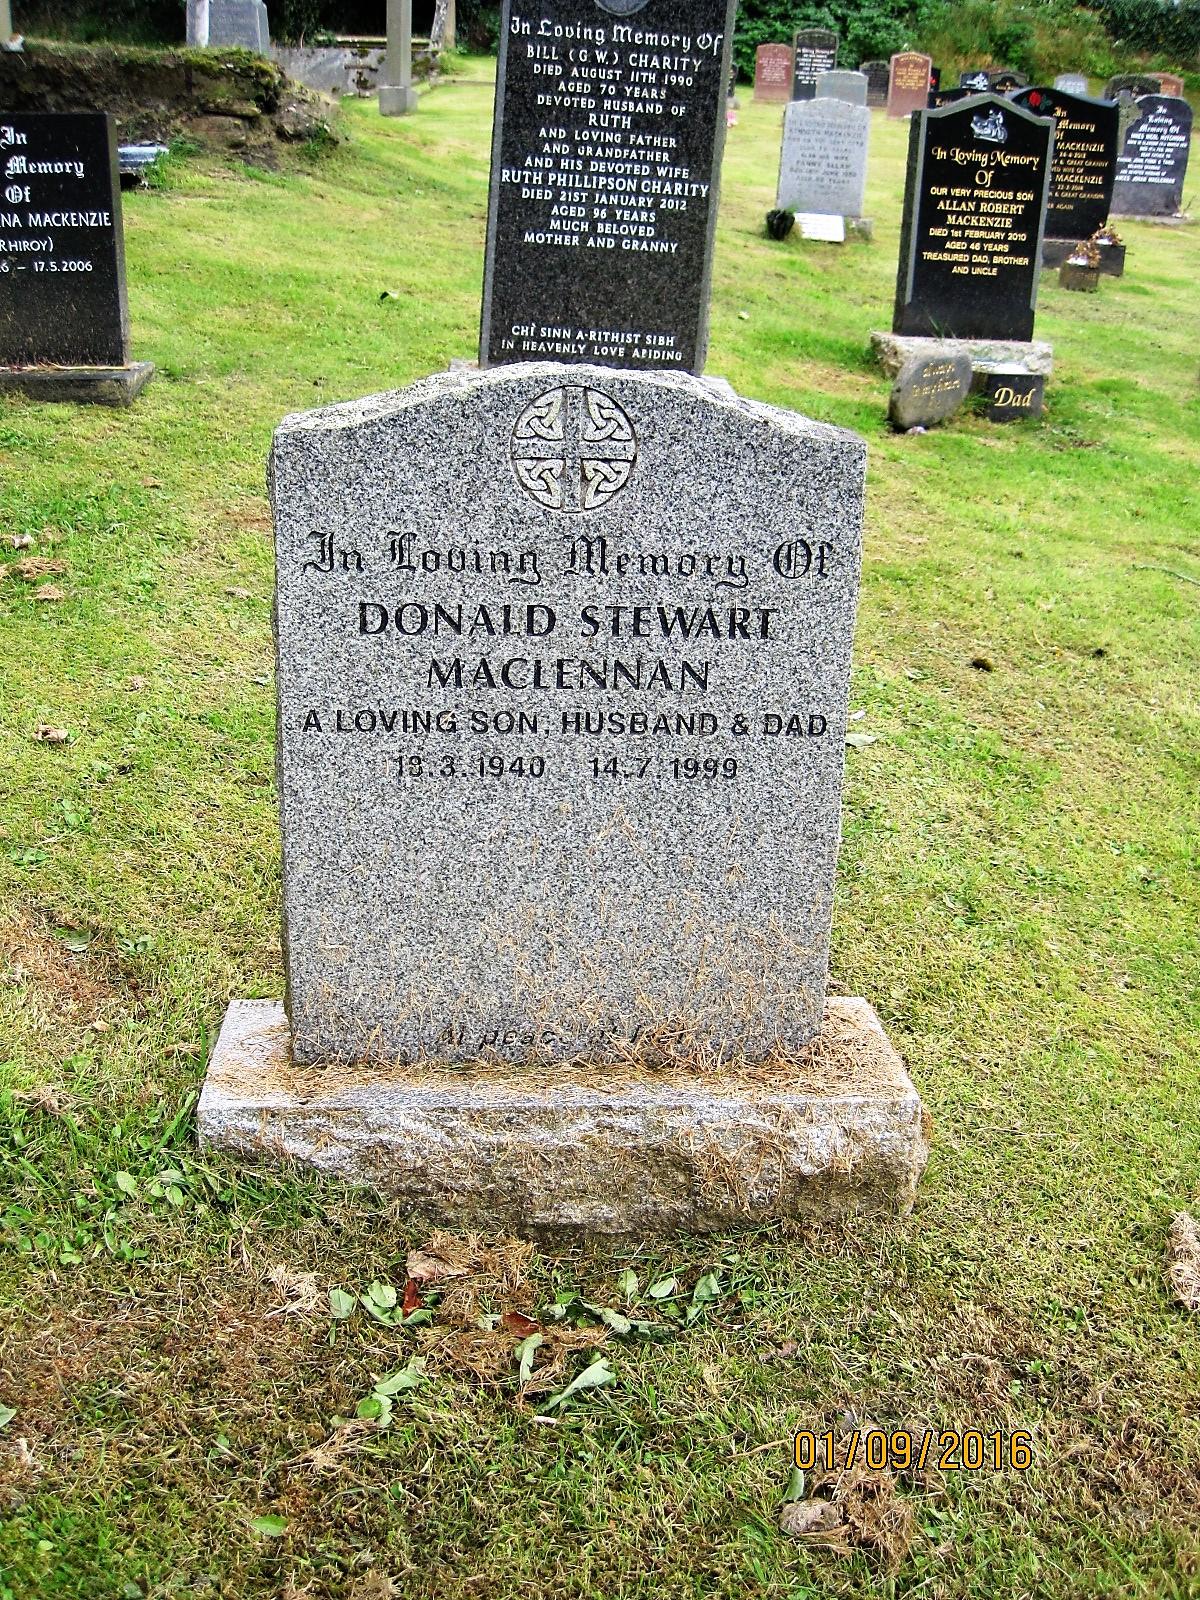 Donald Stewart Maclennan 1999